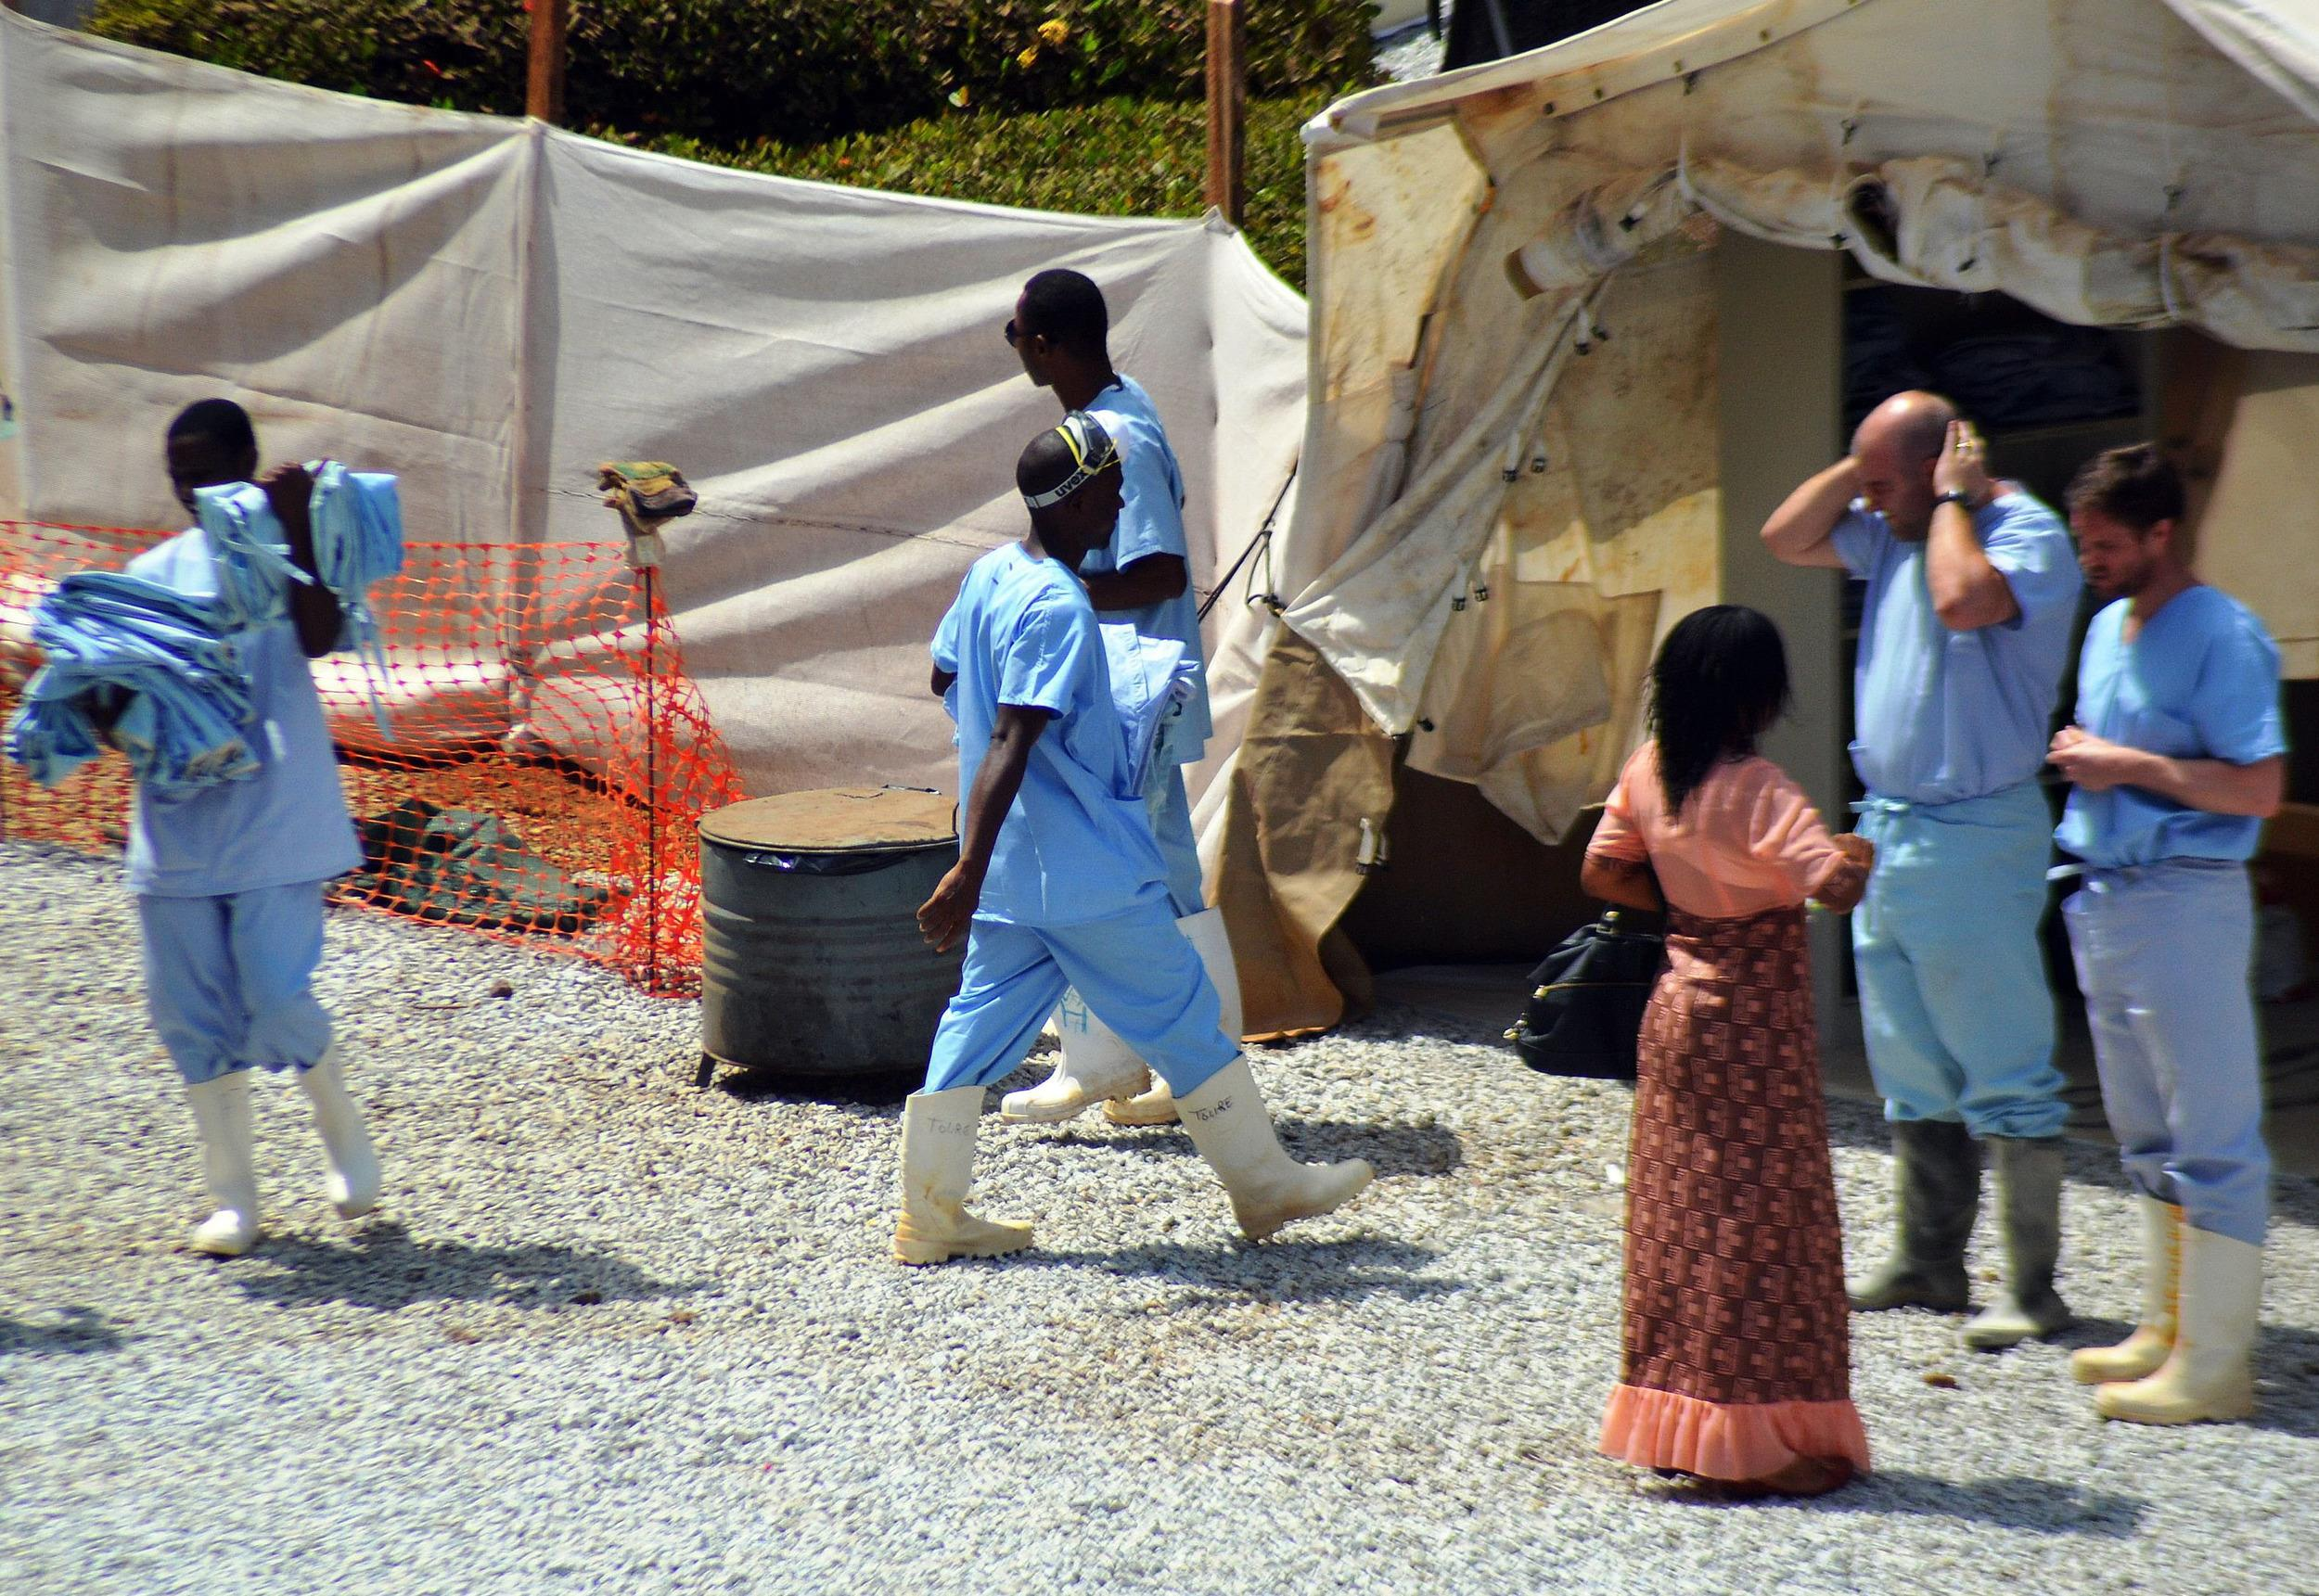 140416-ebola-outbreak-1814_bf8c2025ffe934a9d3a4d8fe32a6678f